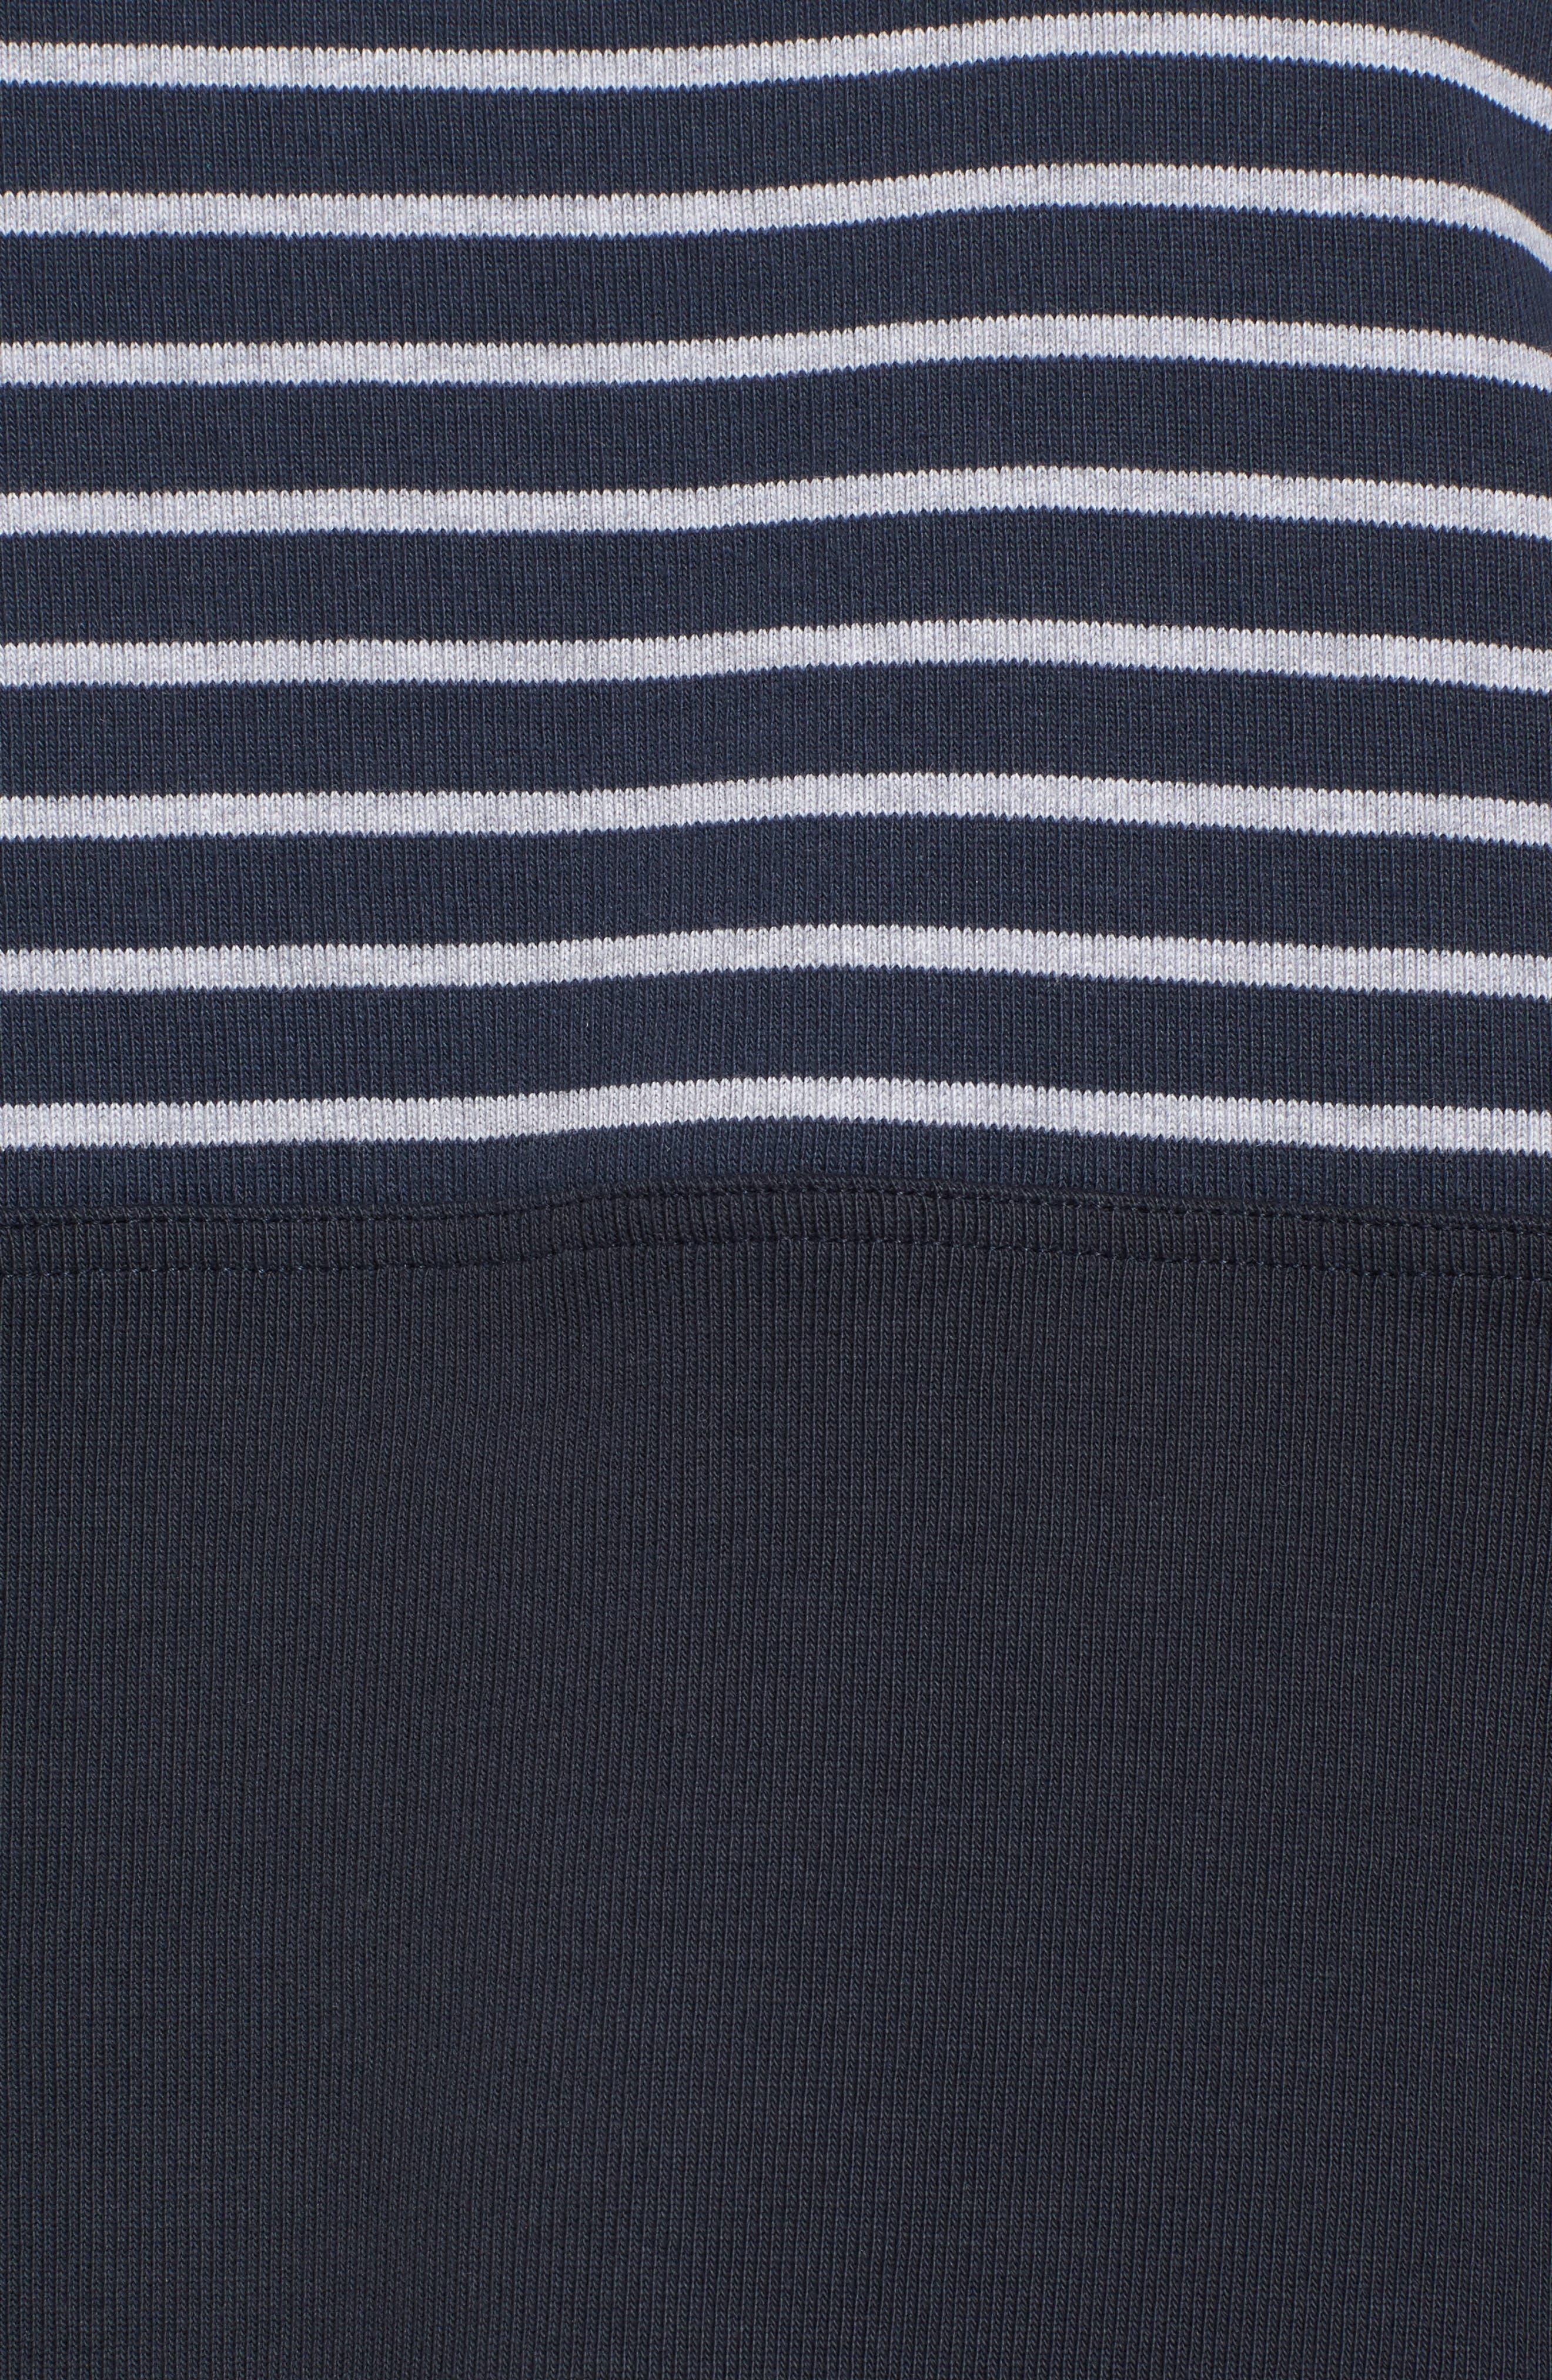 Seaburn Stripe Sweatshirt,                             Alternate thumbnail 5, color,                             Navy/ Grey